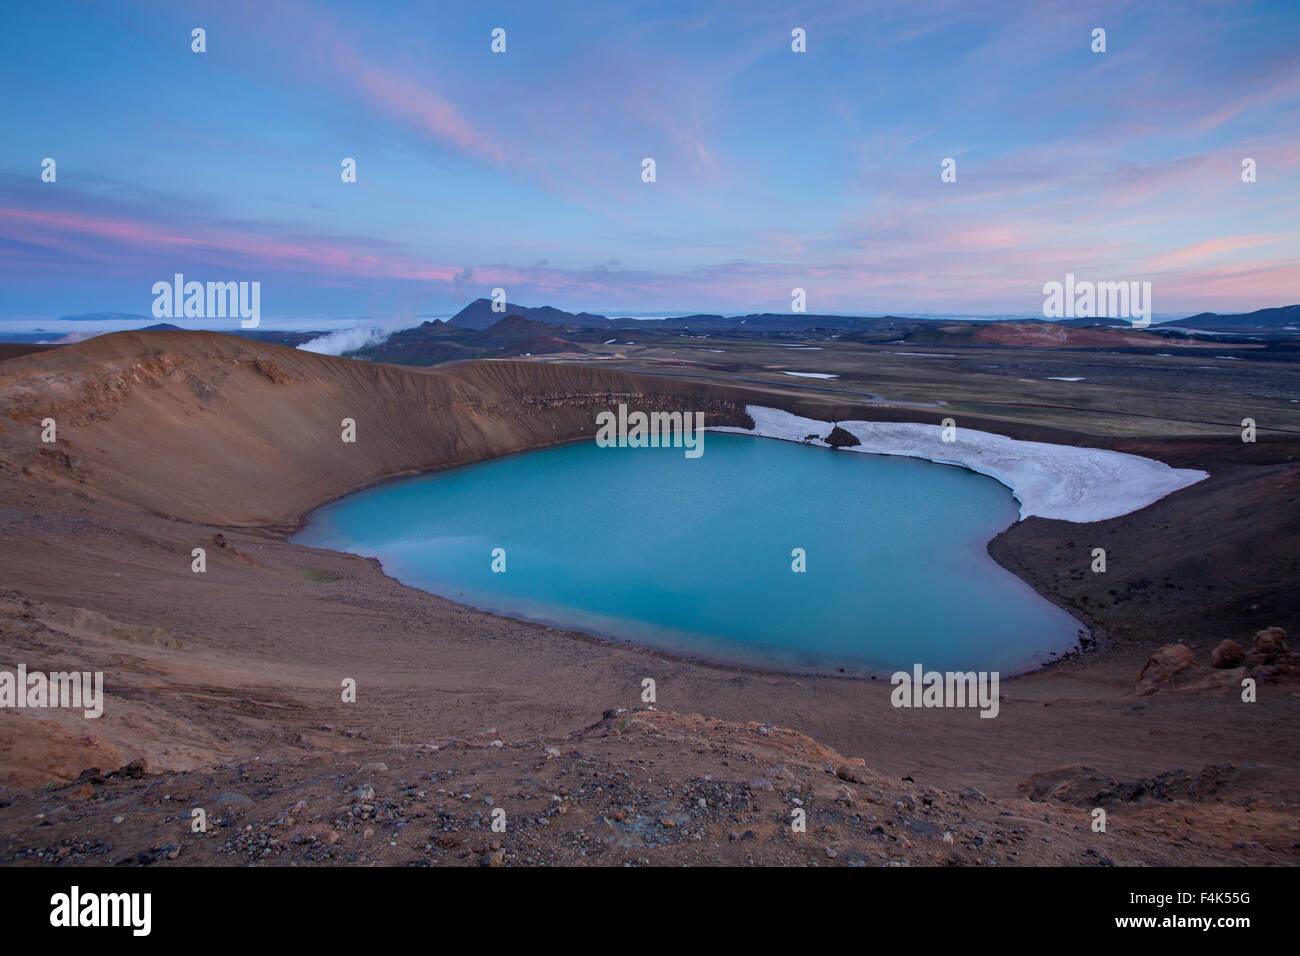 Viti Krater bei Dämmerung, Krafla Vulkangebiet, Myvatn, Nordhurland Eystra, Island. Stockbild